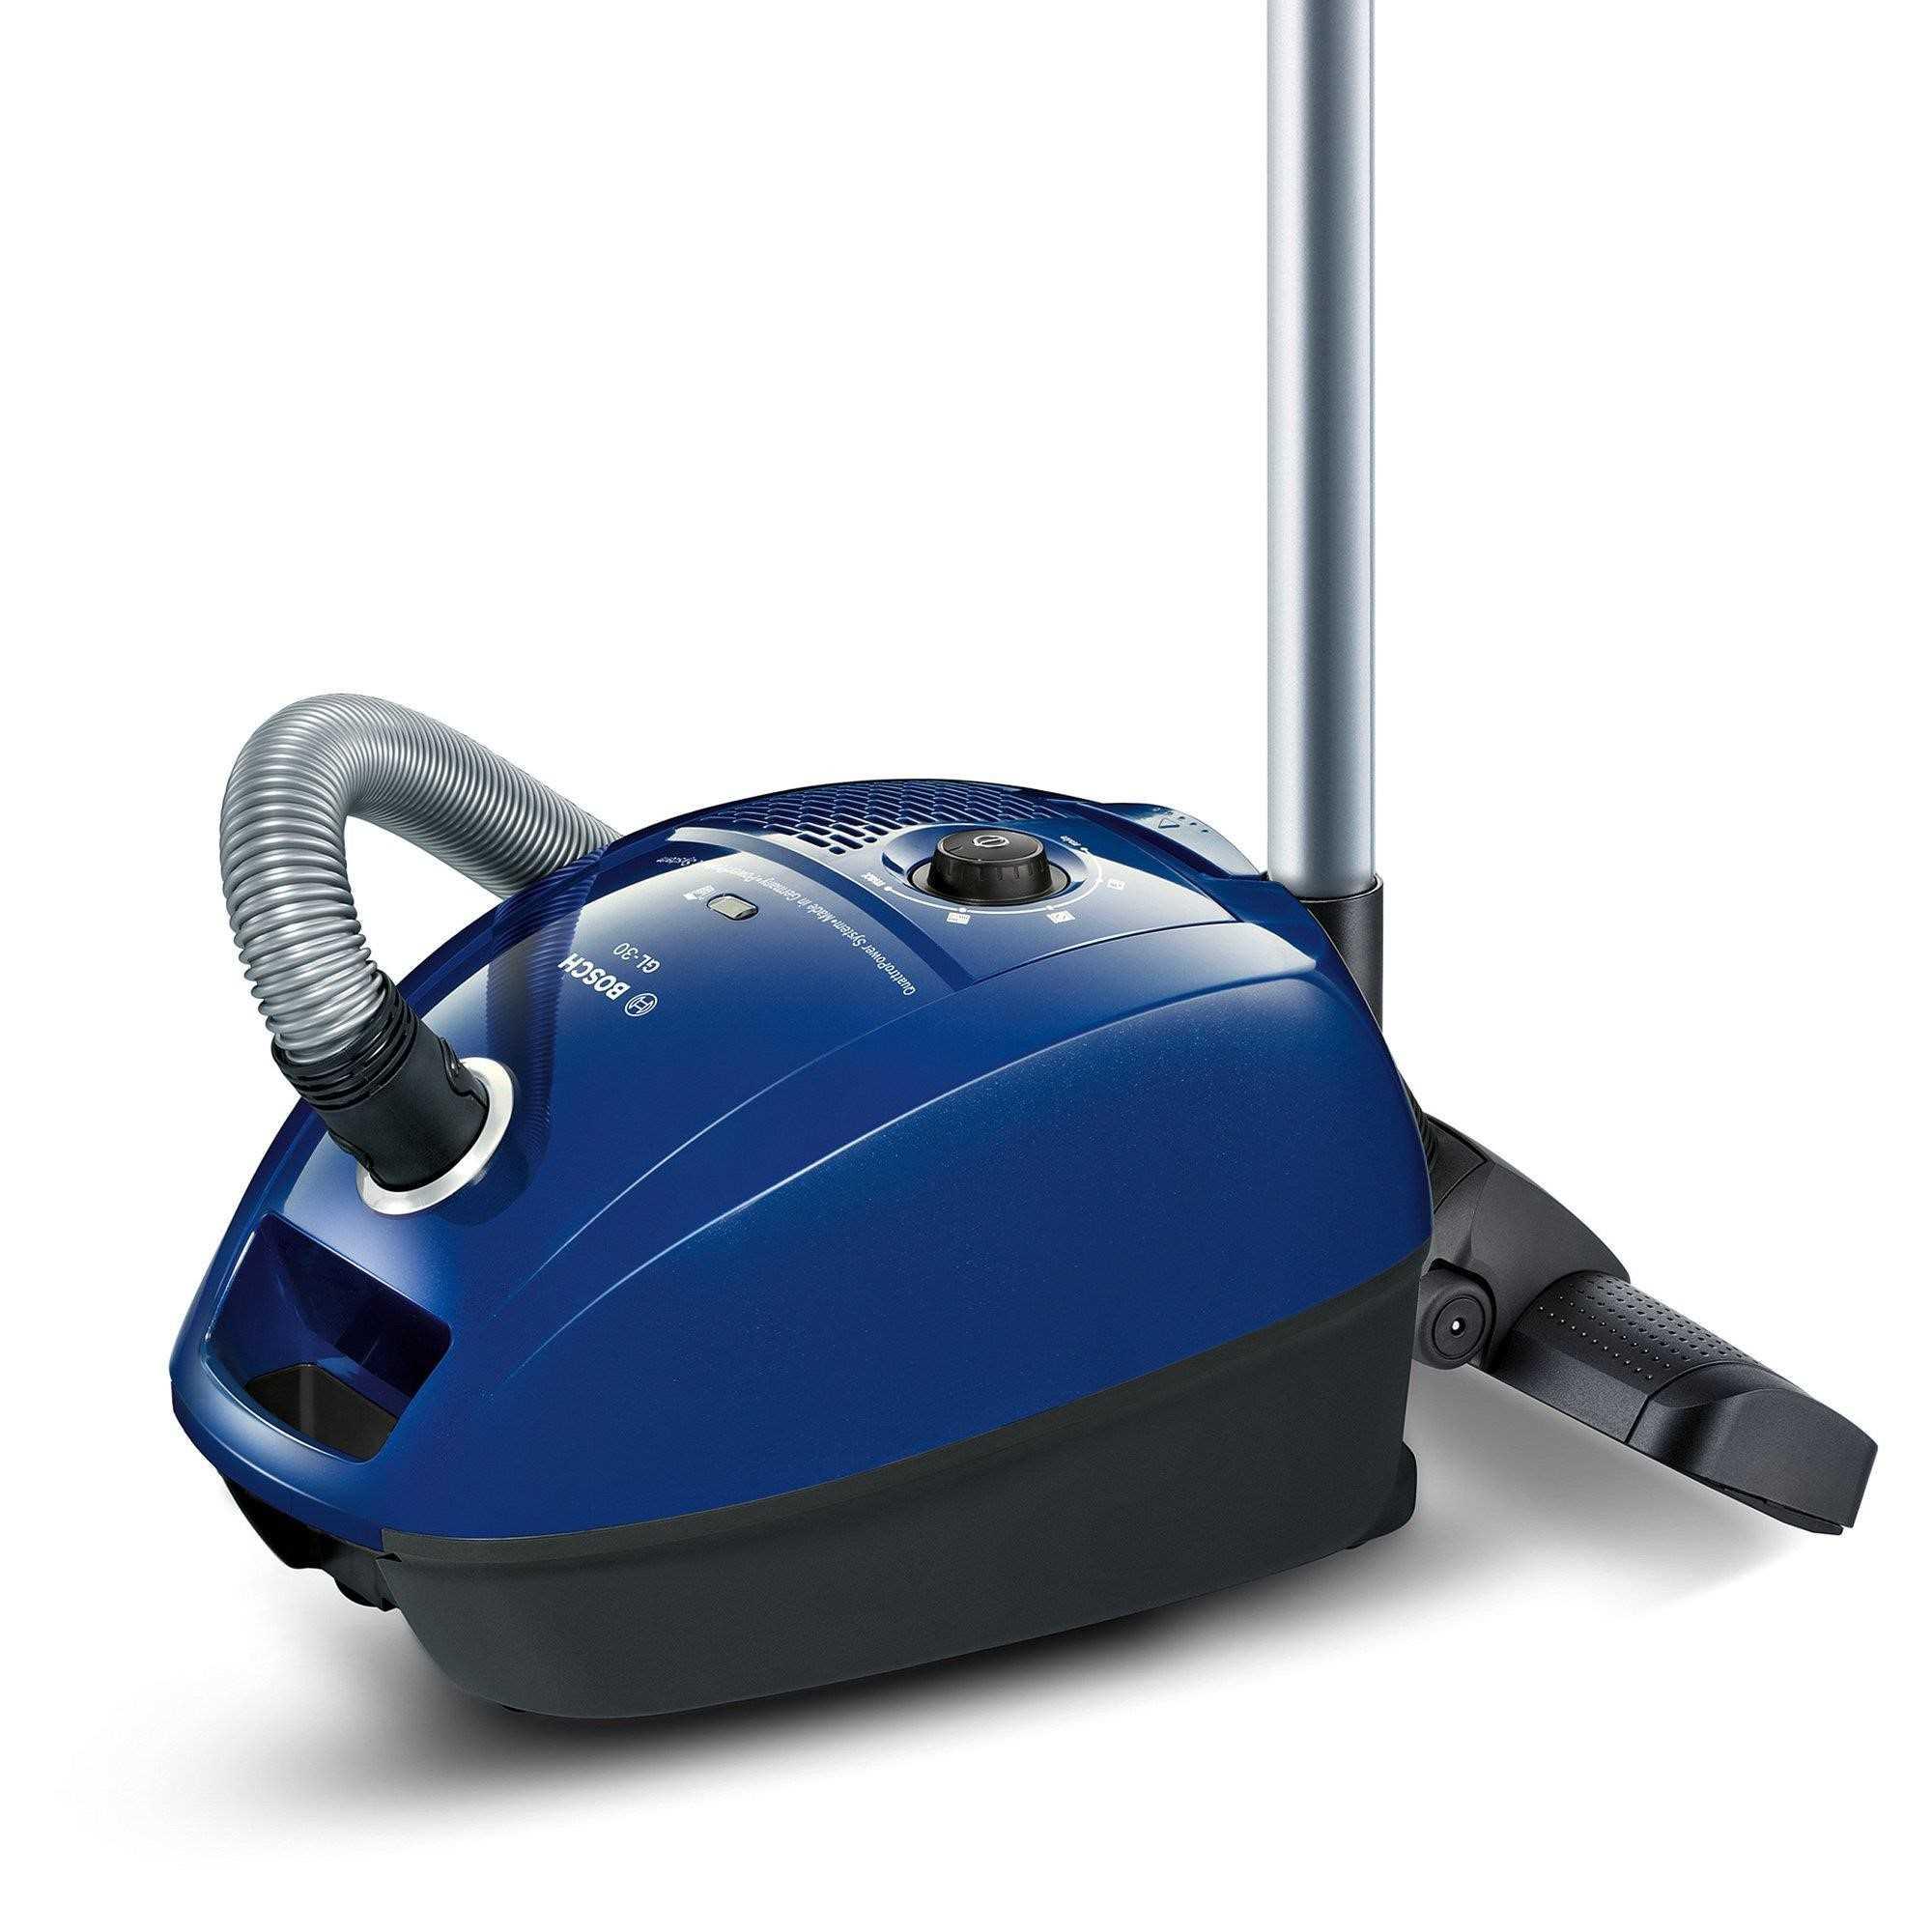 Mejor Bolsas Aspiradora Bosch Gl 30